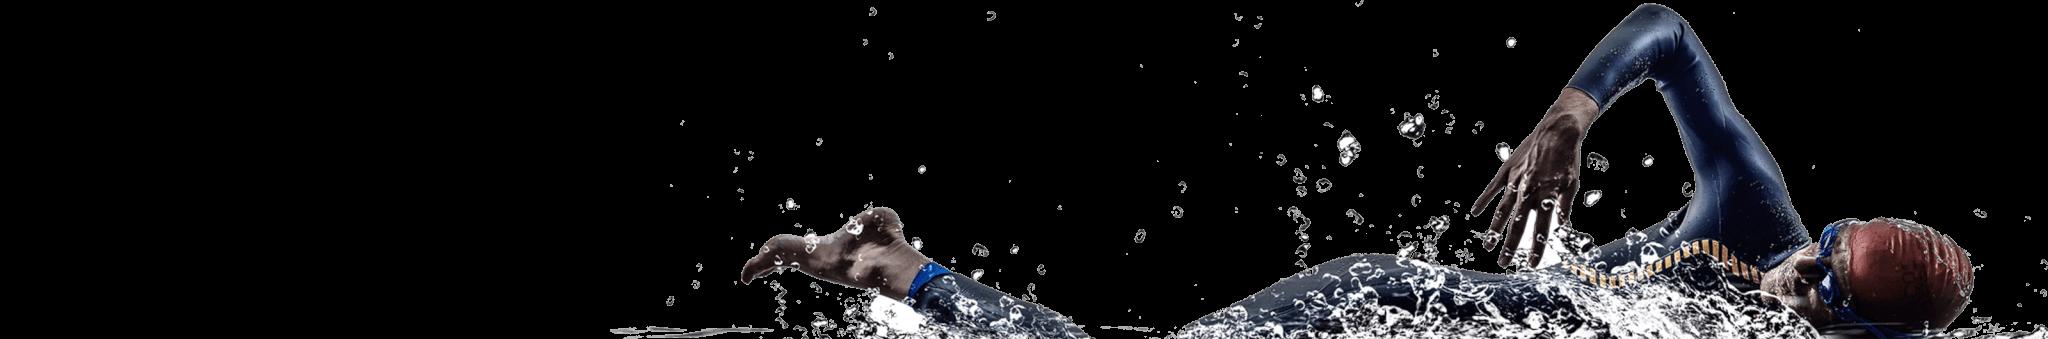 https://www.amsterdamwaterproof.nl/wp-content/uploads/2017/10/inner_swimmer.png